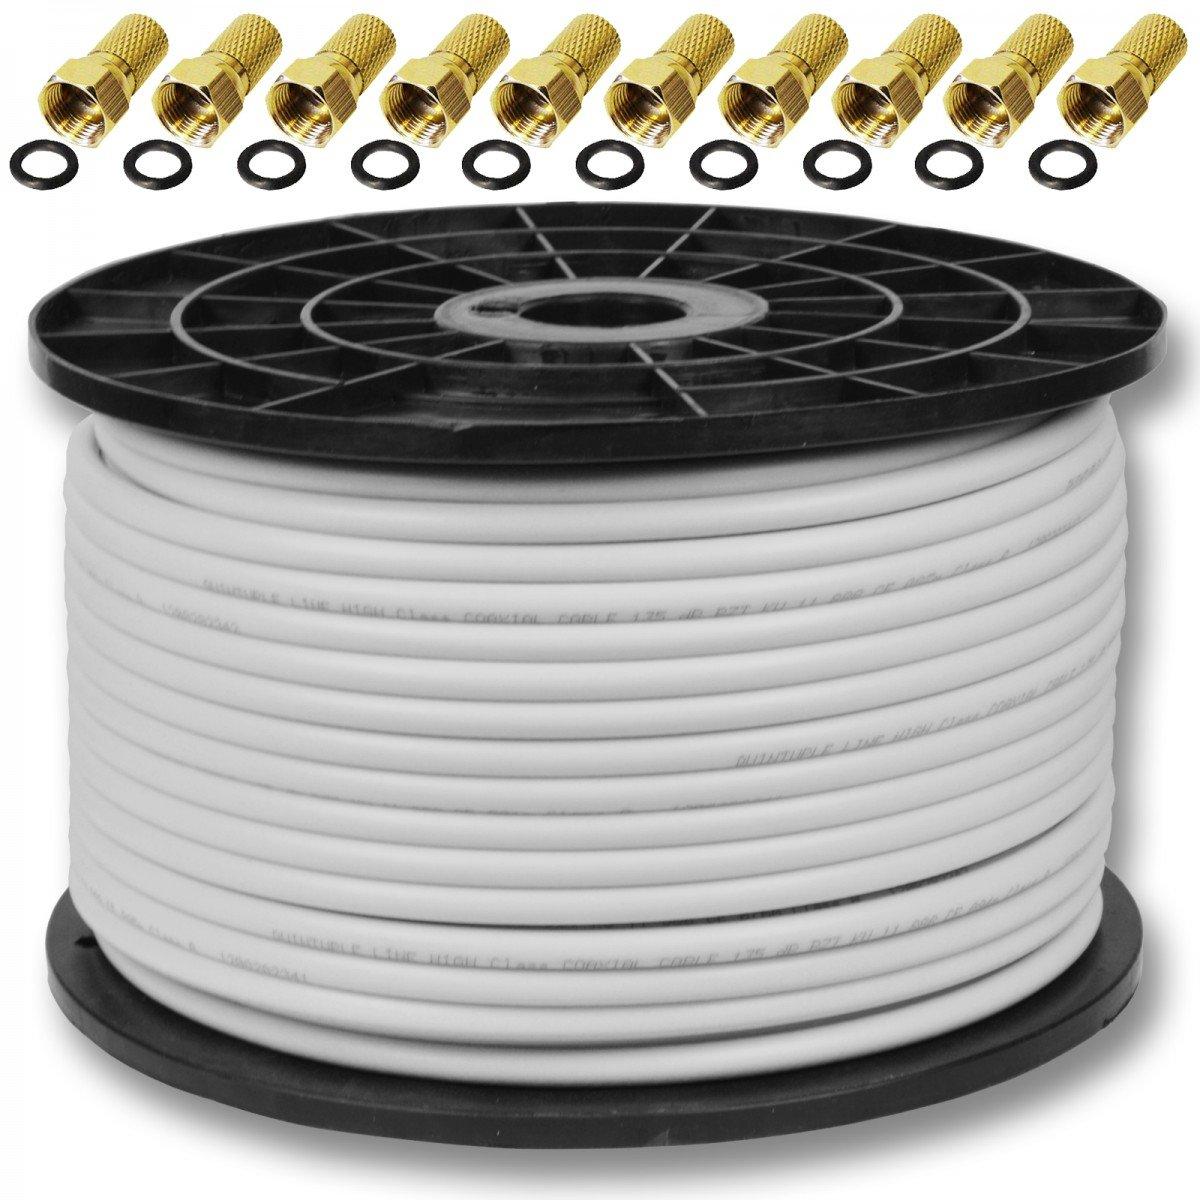 100m 135dB Sat Koaxialkabel Koax Kabel FullHD UltraHD: Amazon.de ...